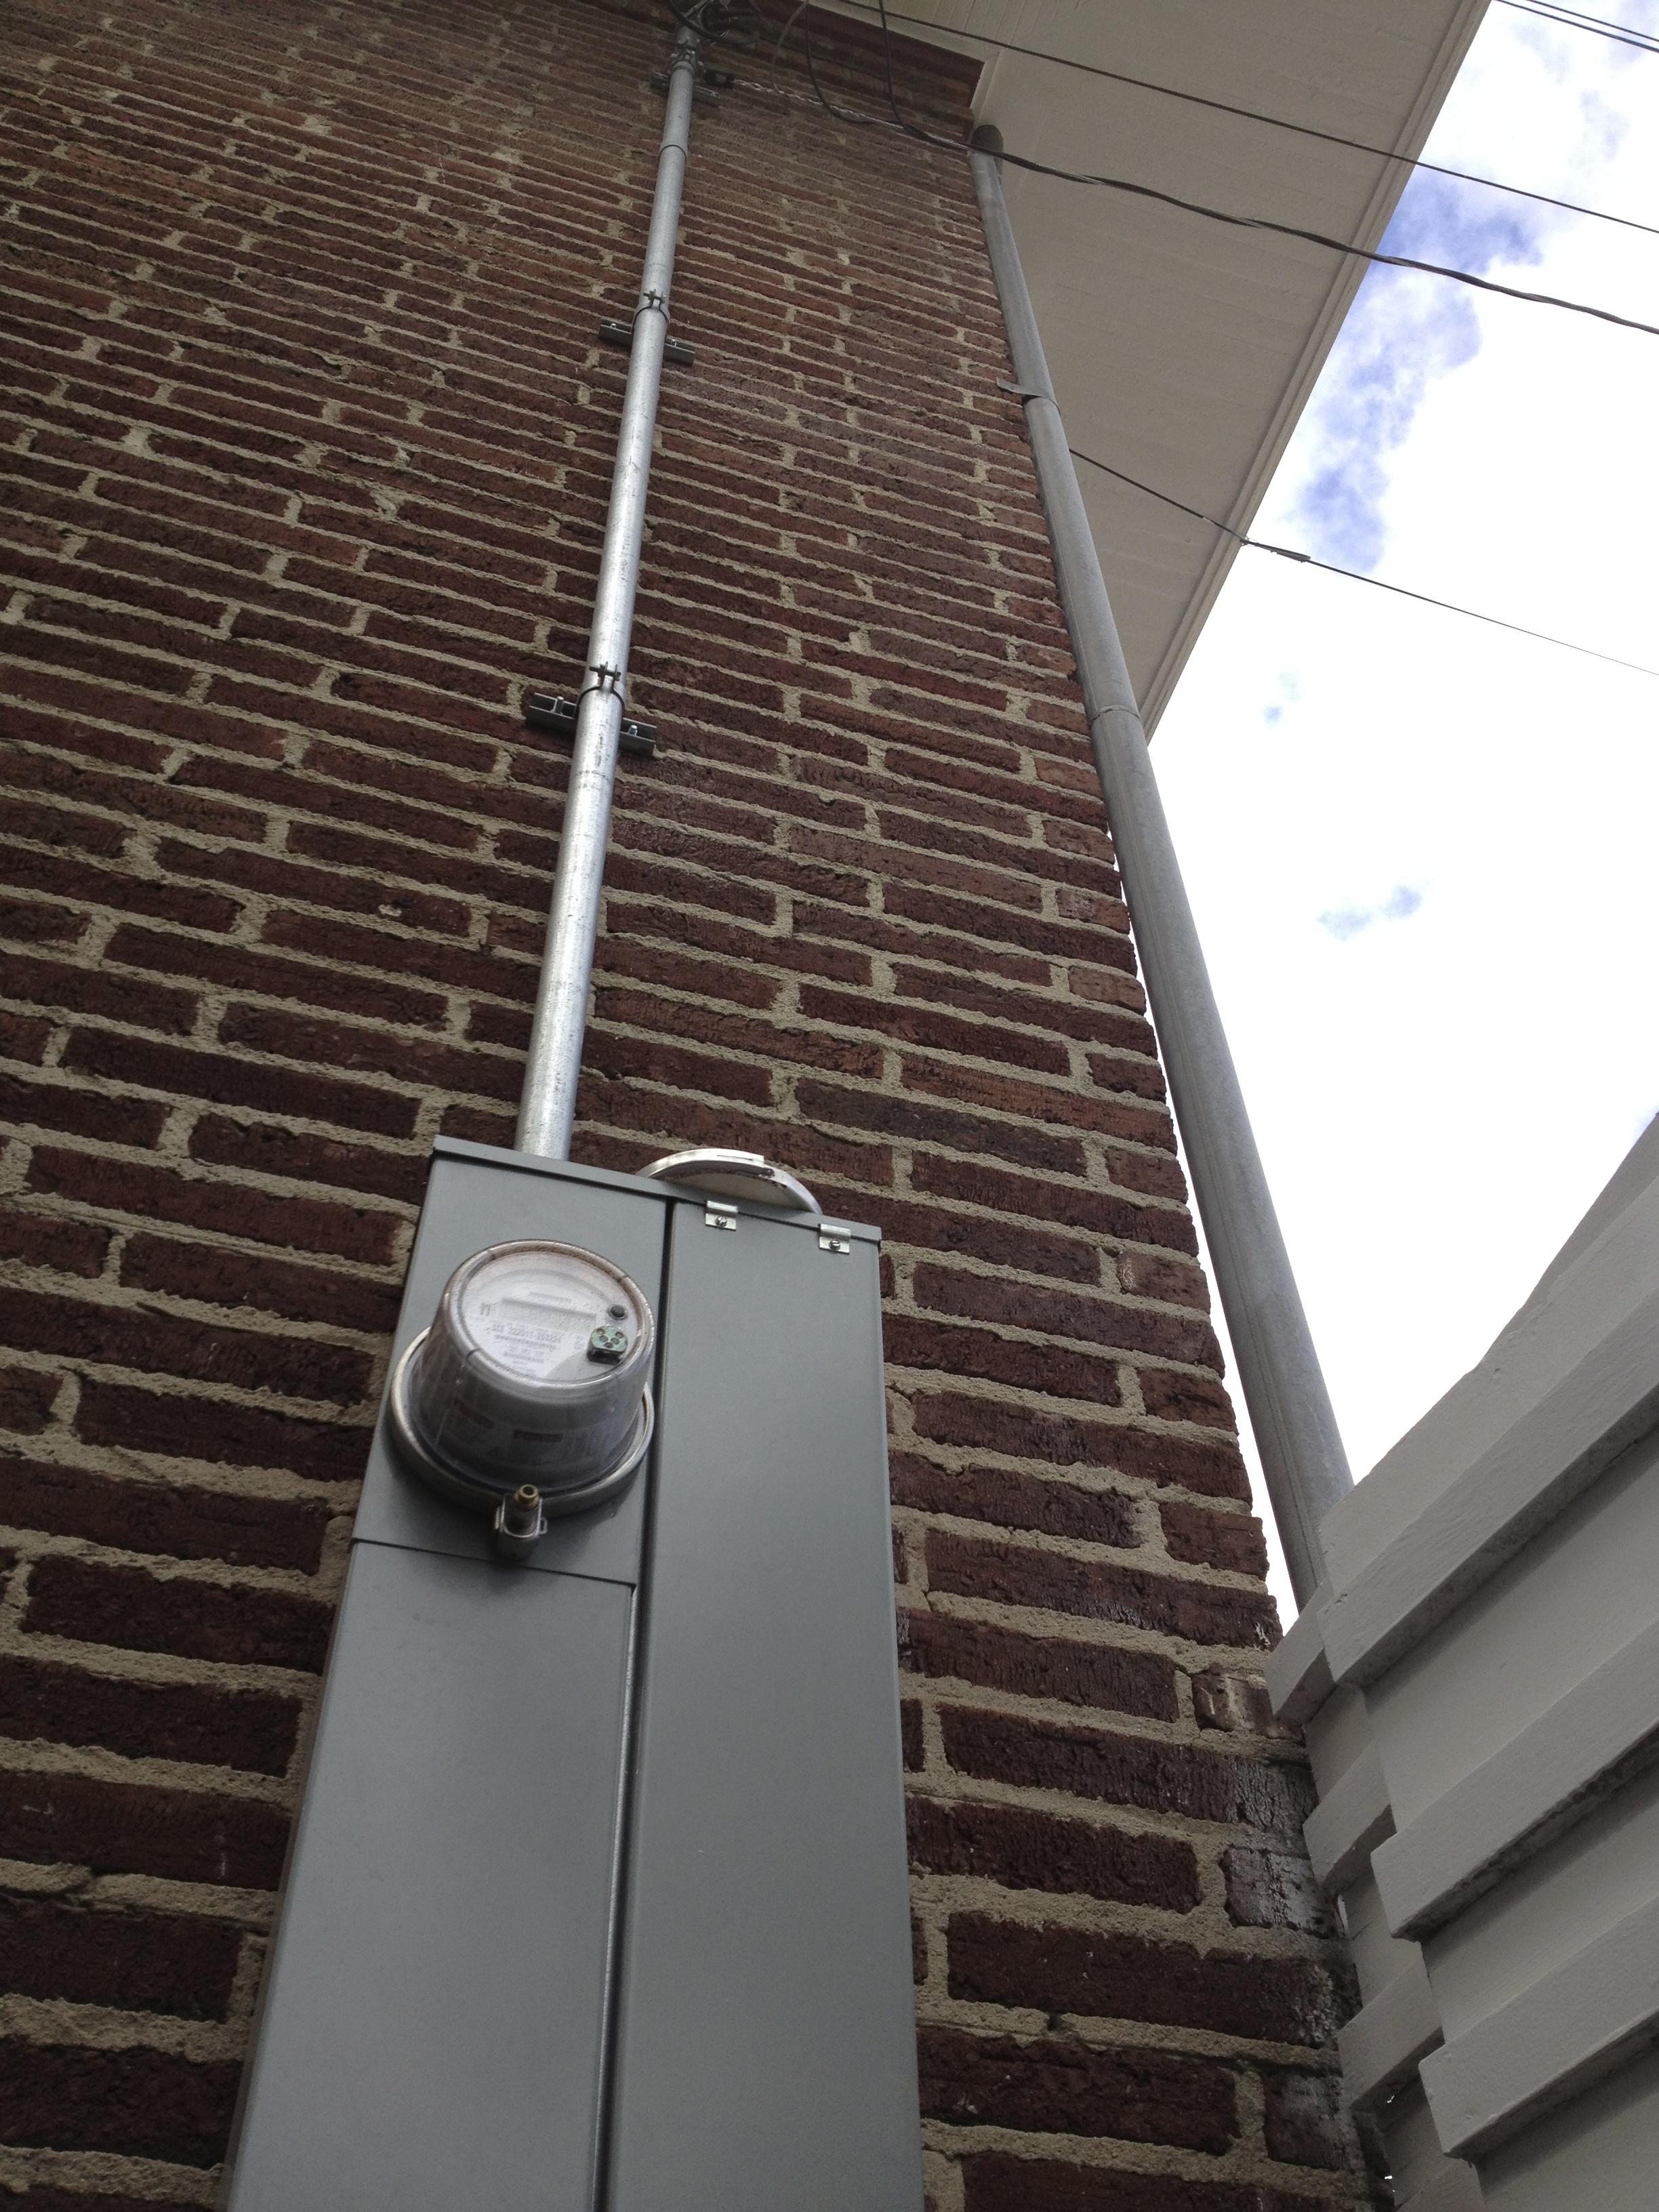 200 Amp Panel Riser/Service Connect